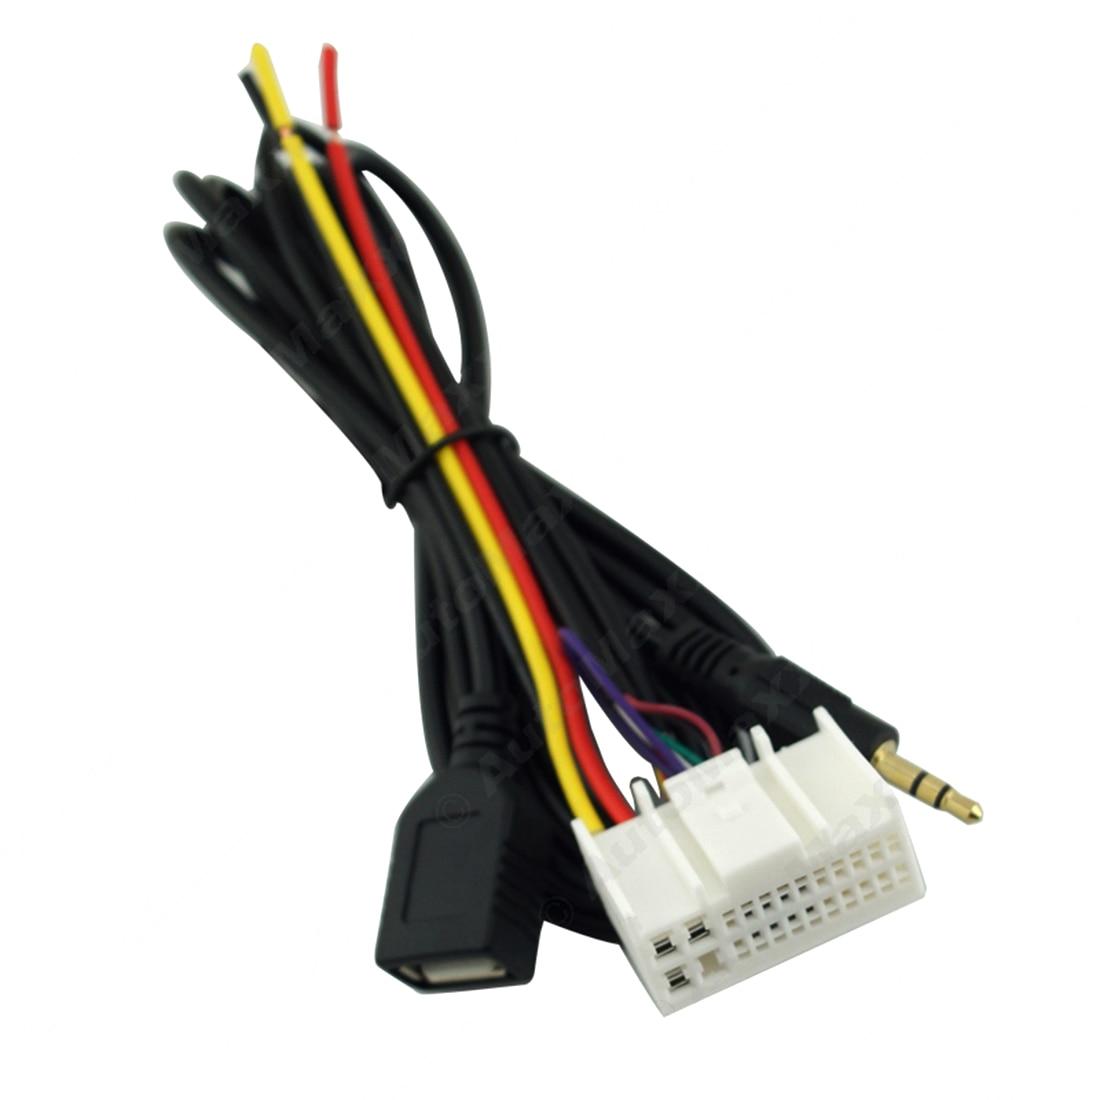 hight resolution of jvc kd r300 wiring harness adapter wiring diagram fascinatingjvc kd r300 wiring harness adapter wiring diagram